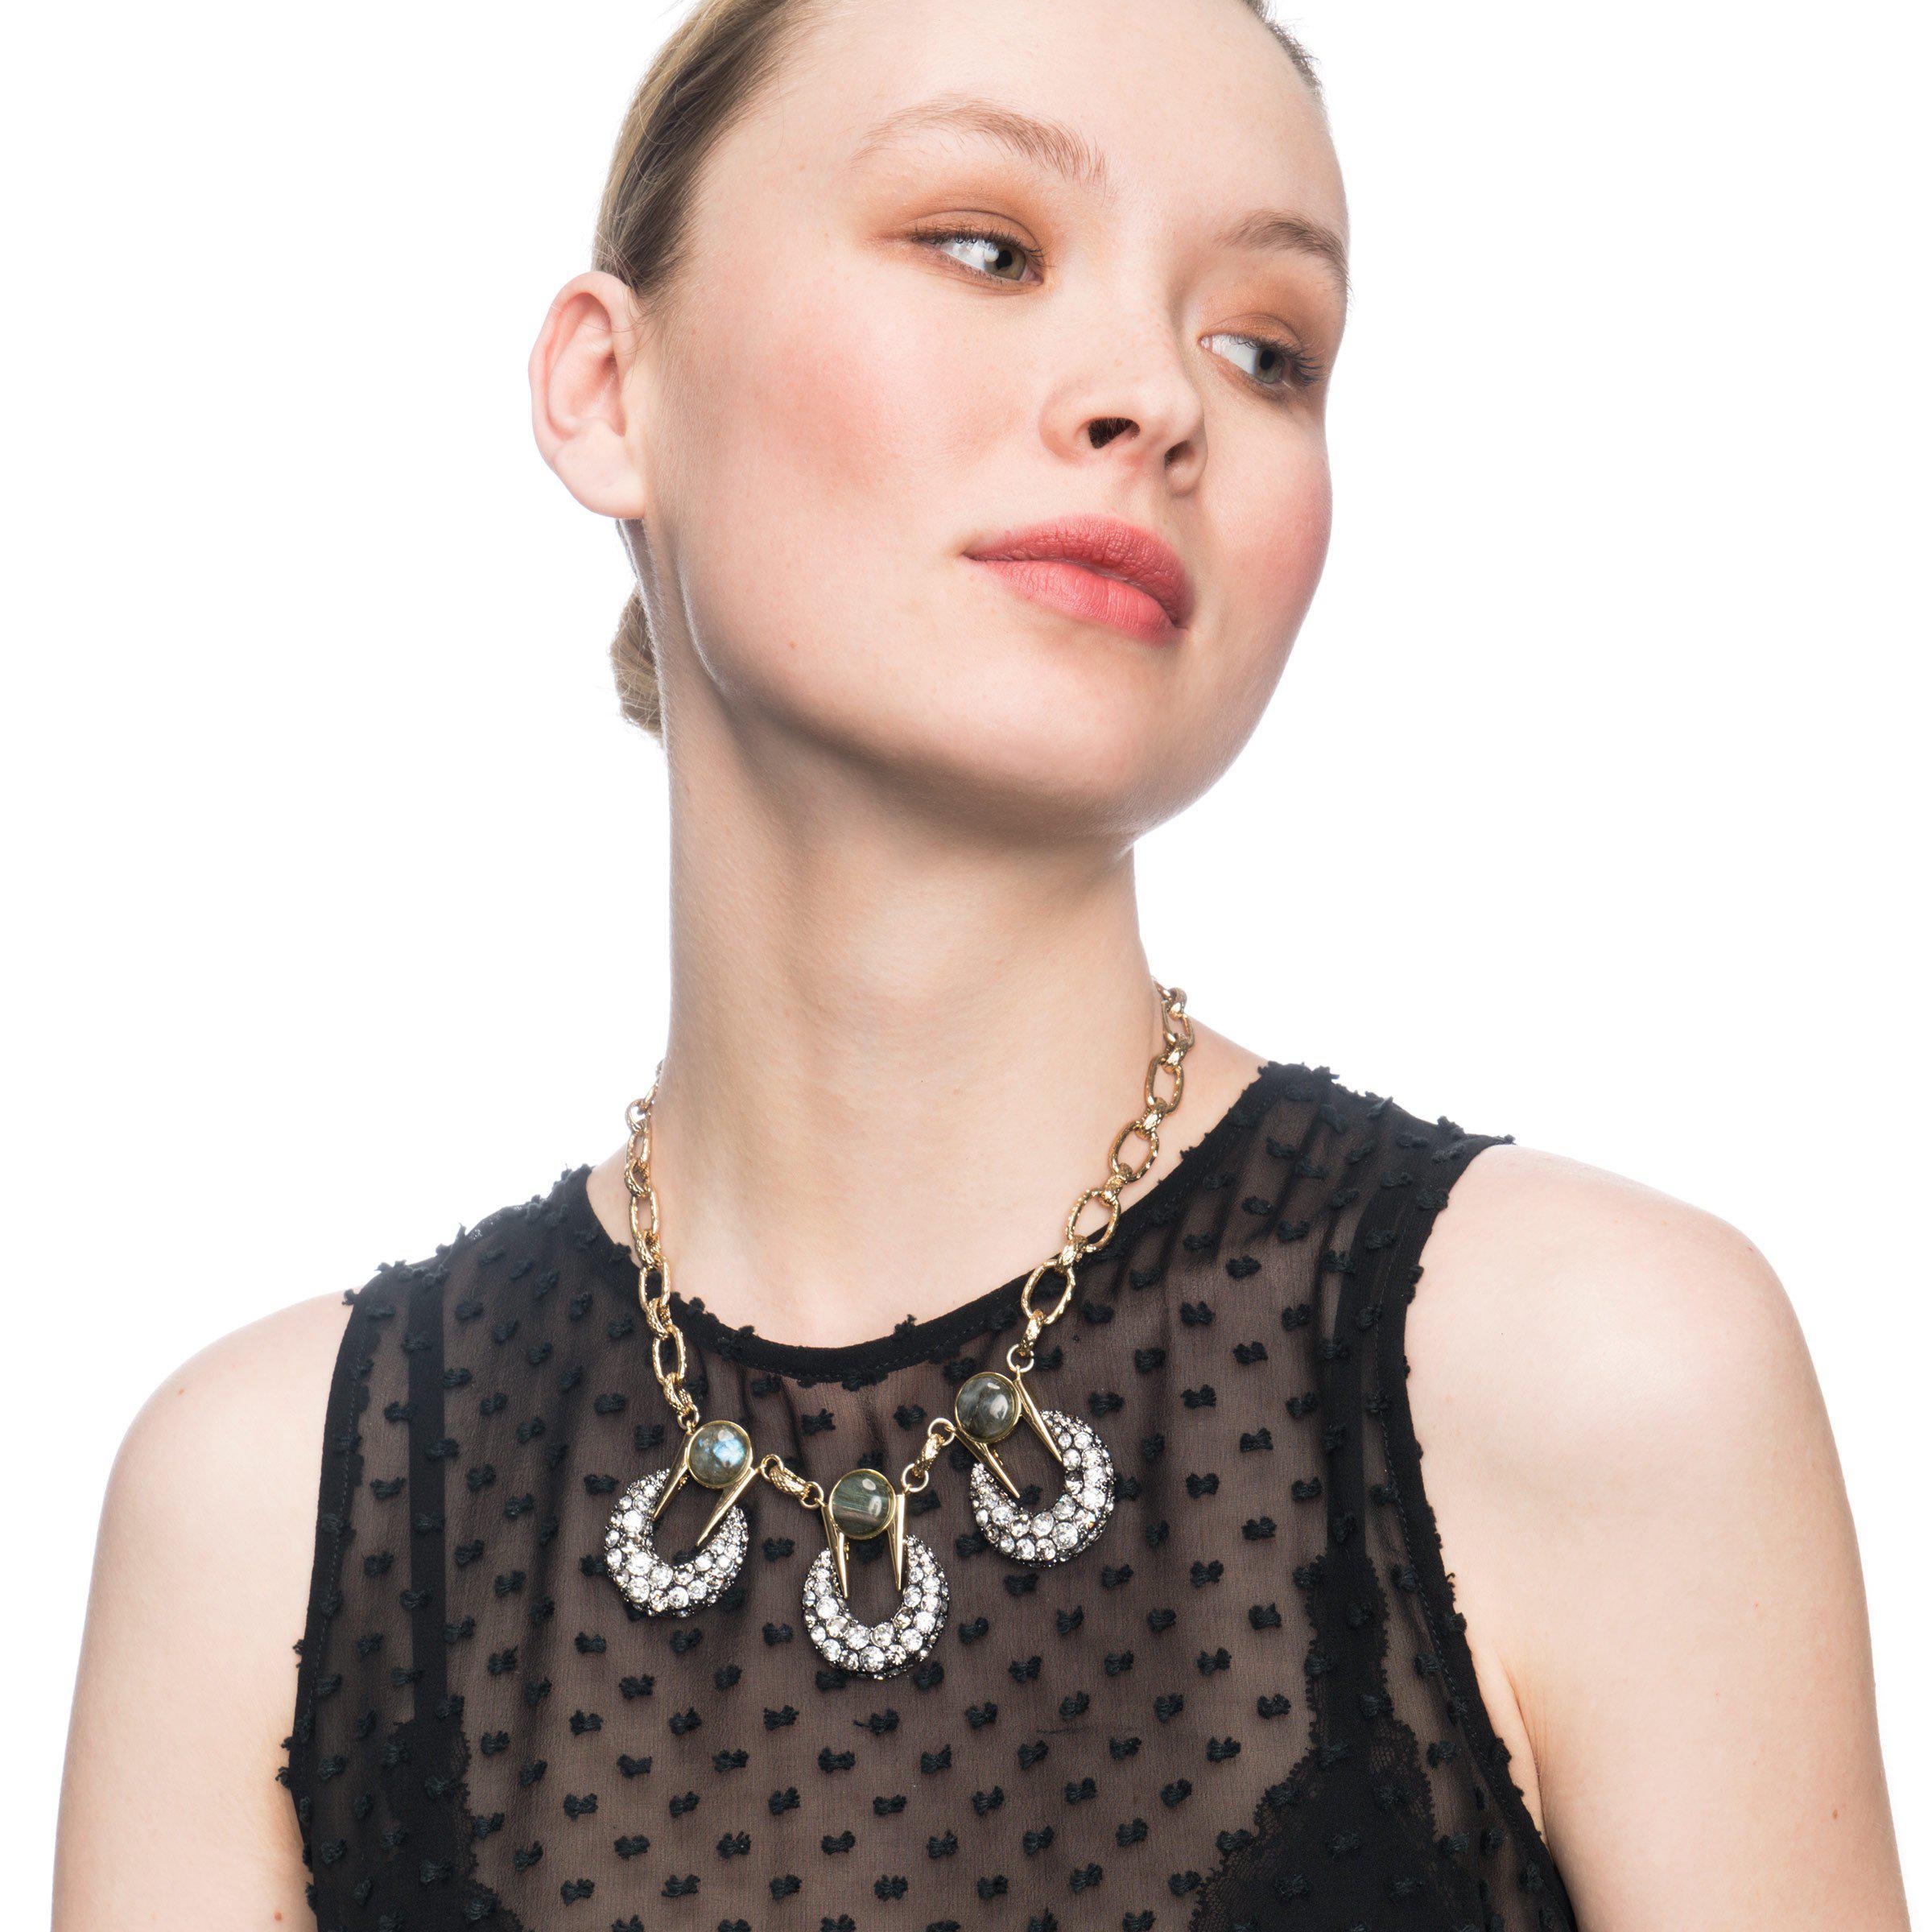 Lulu Frost Laumiere Triple Pendant Necklace MLiKMCVhE